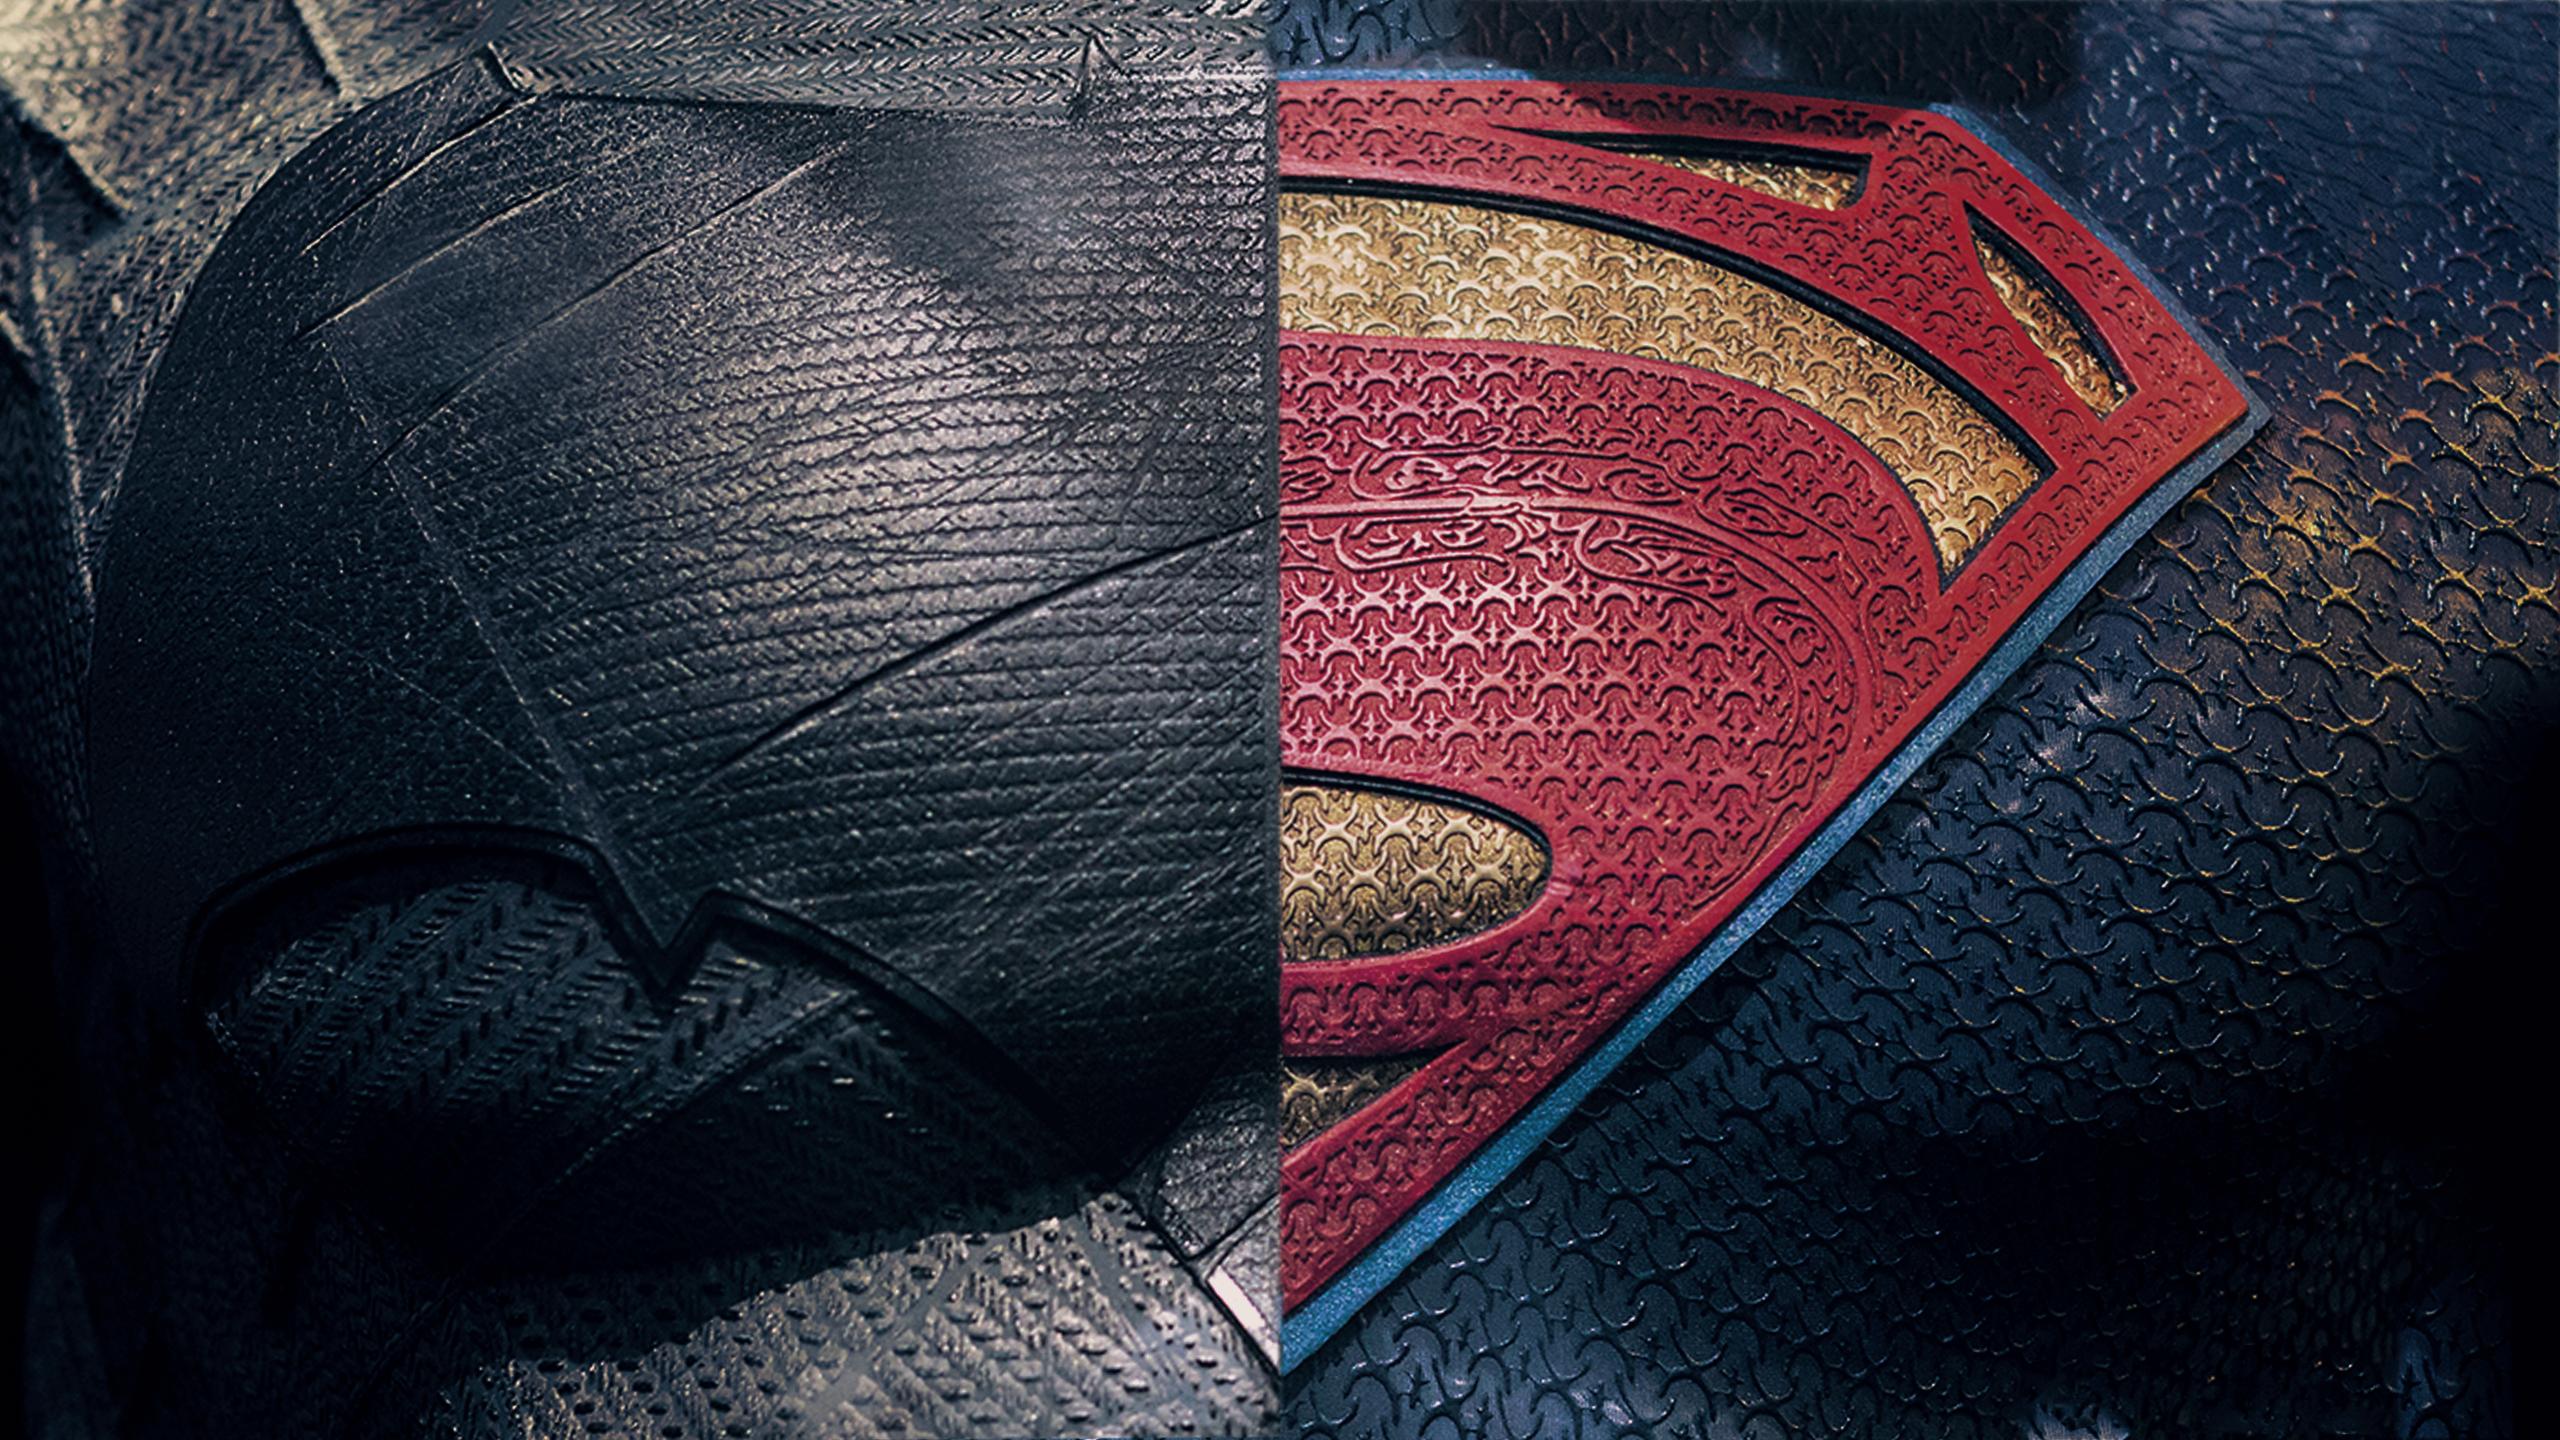 batman v superman wallpapermessypandas on deviantart